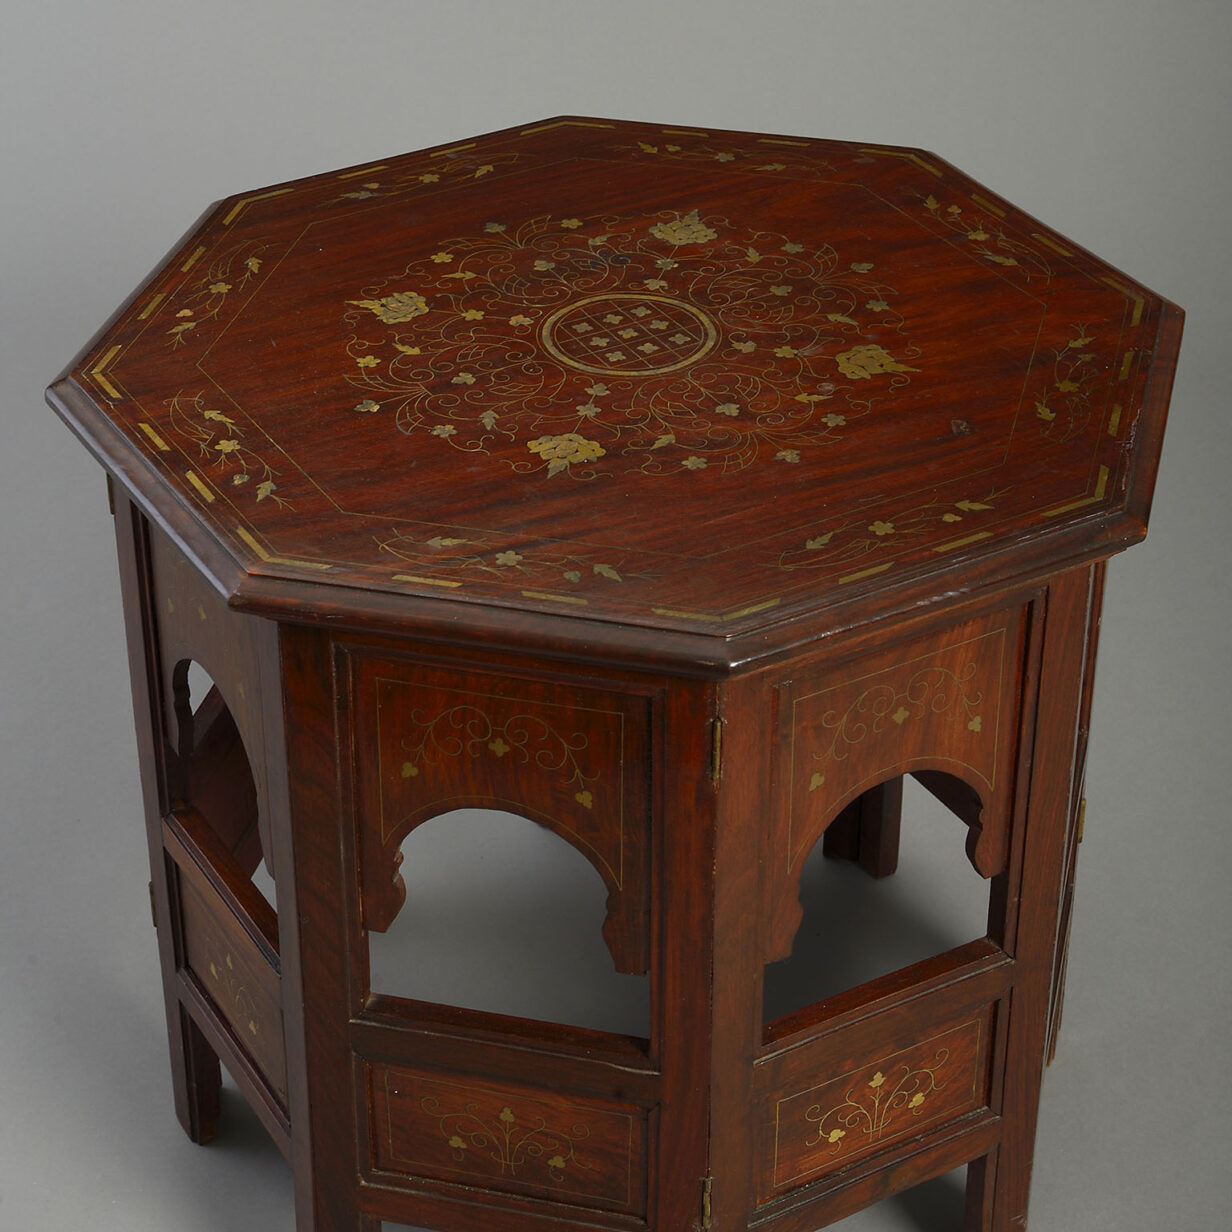 Octagonal Folding Table